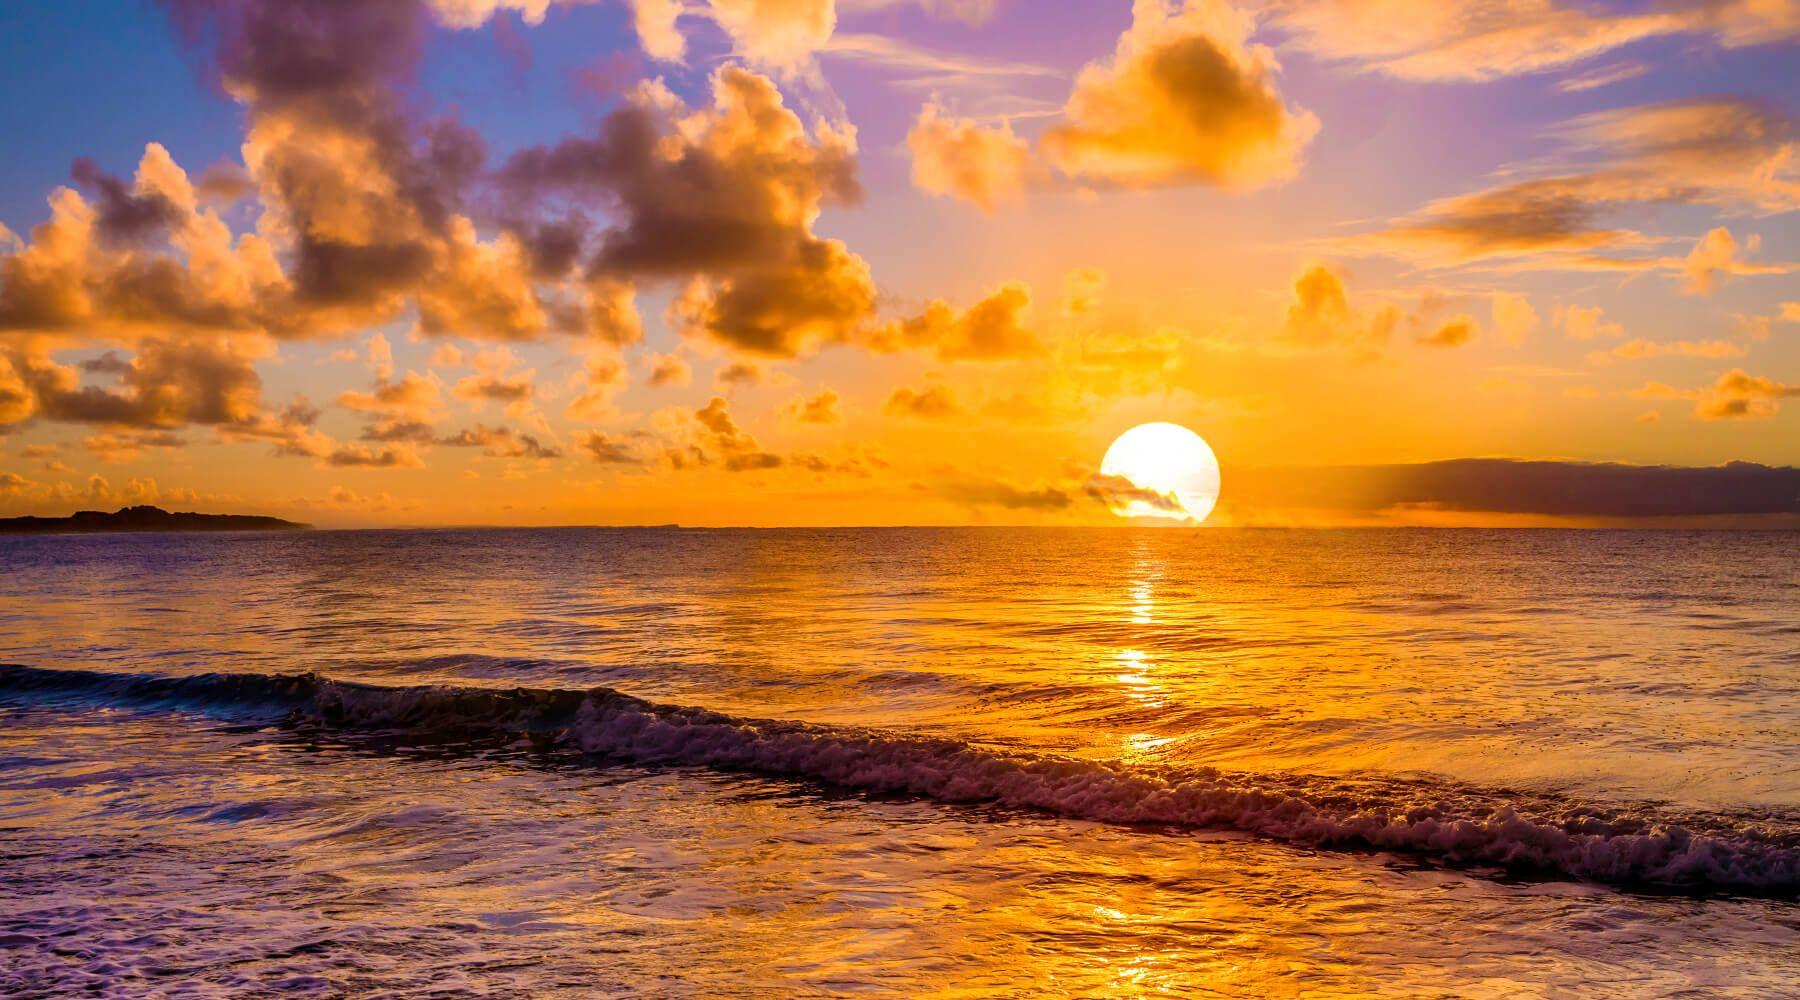 2021 Sunrise Sunset Tableszip Code | Printable regarding Sunset Times In Zip Code 12549